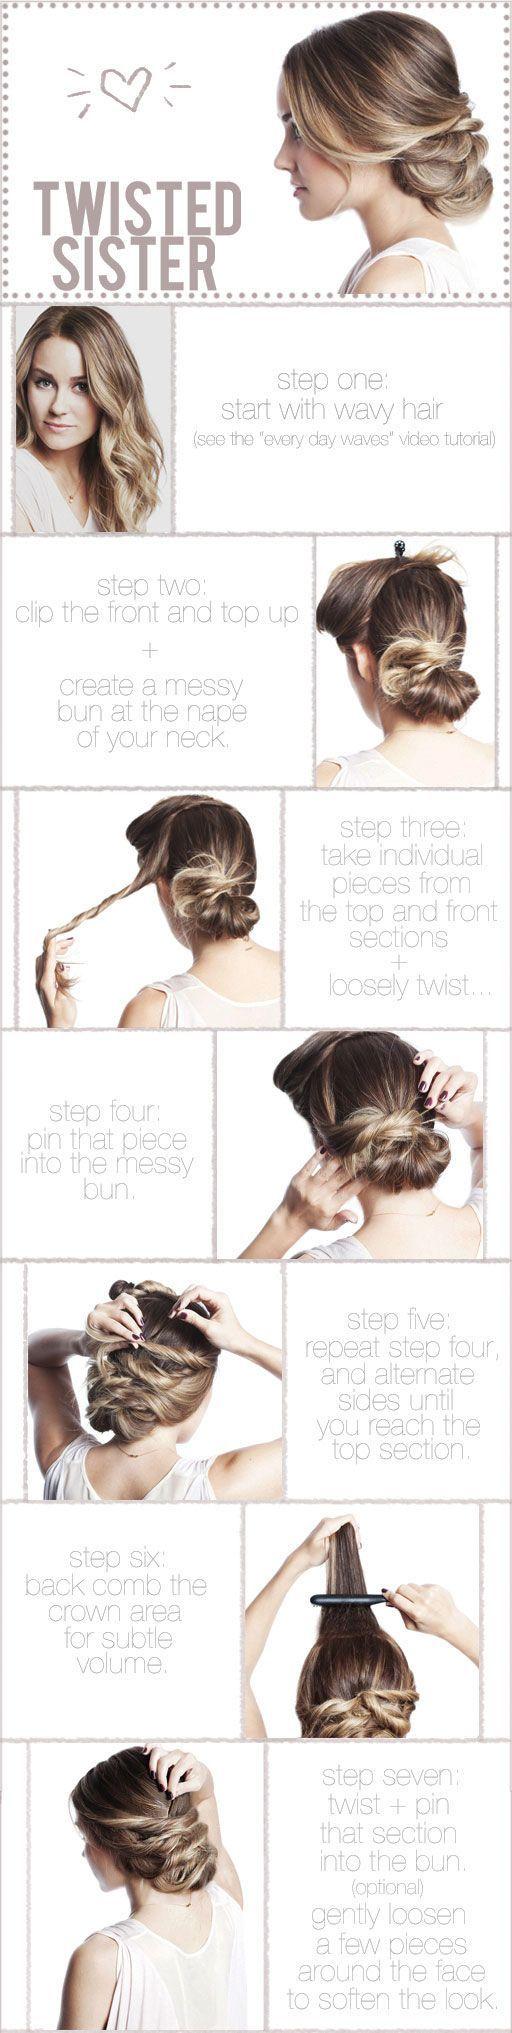 diy hairstyles perfect for prewedding parties formal hair hair